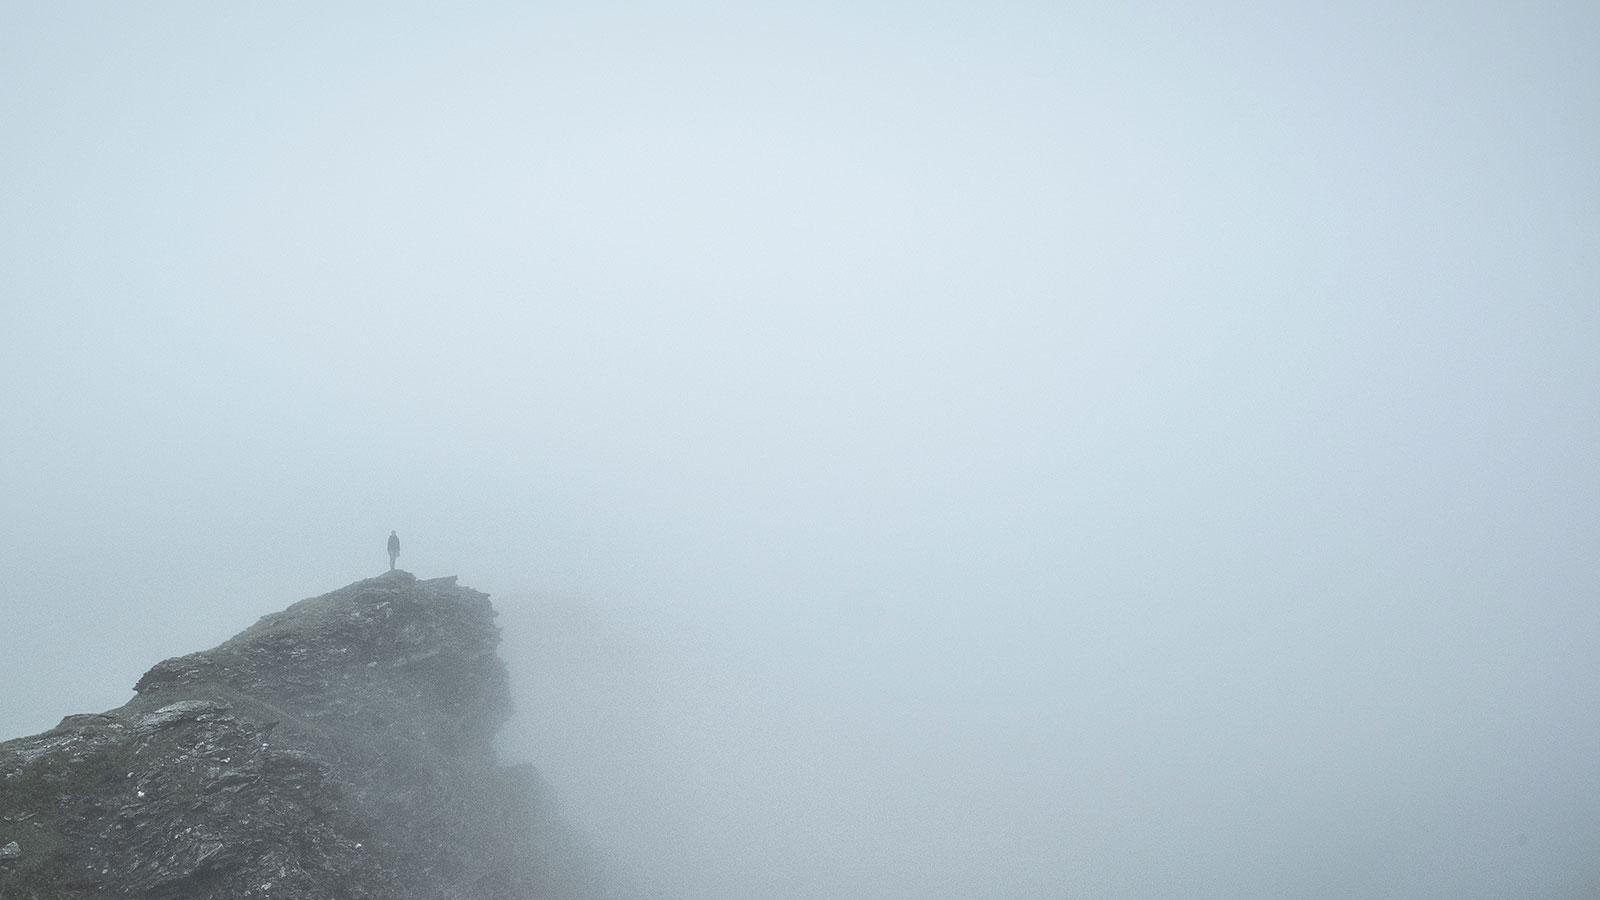 Unsicher. Berge in Südtirol | Pauli Trenkwalder, Berge & Psychologie